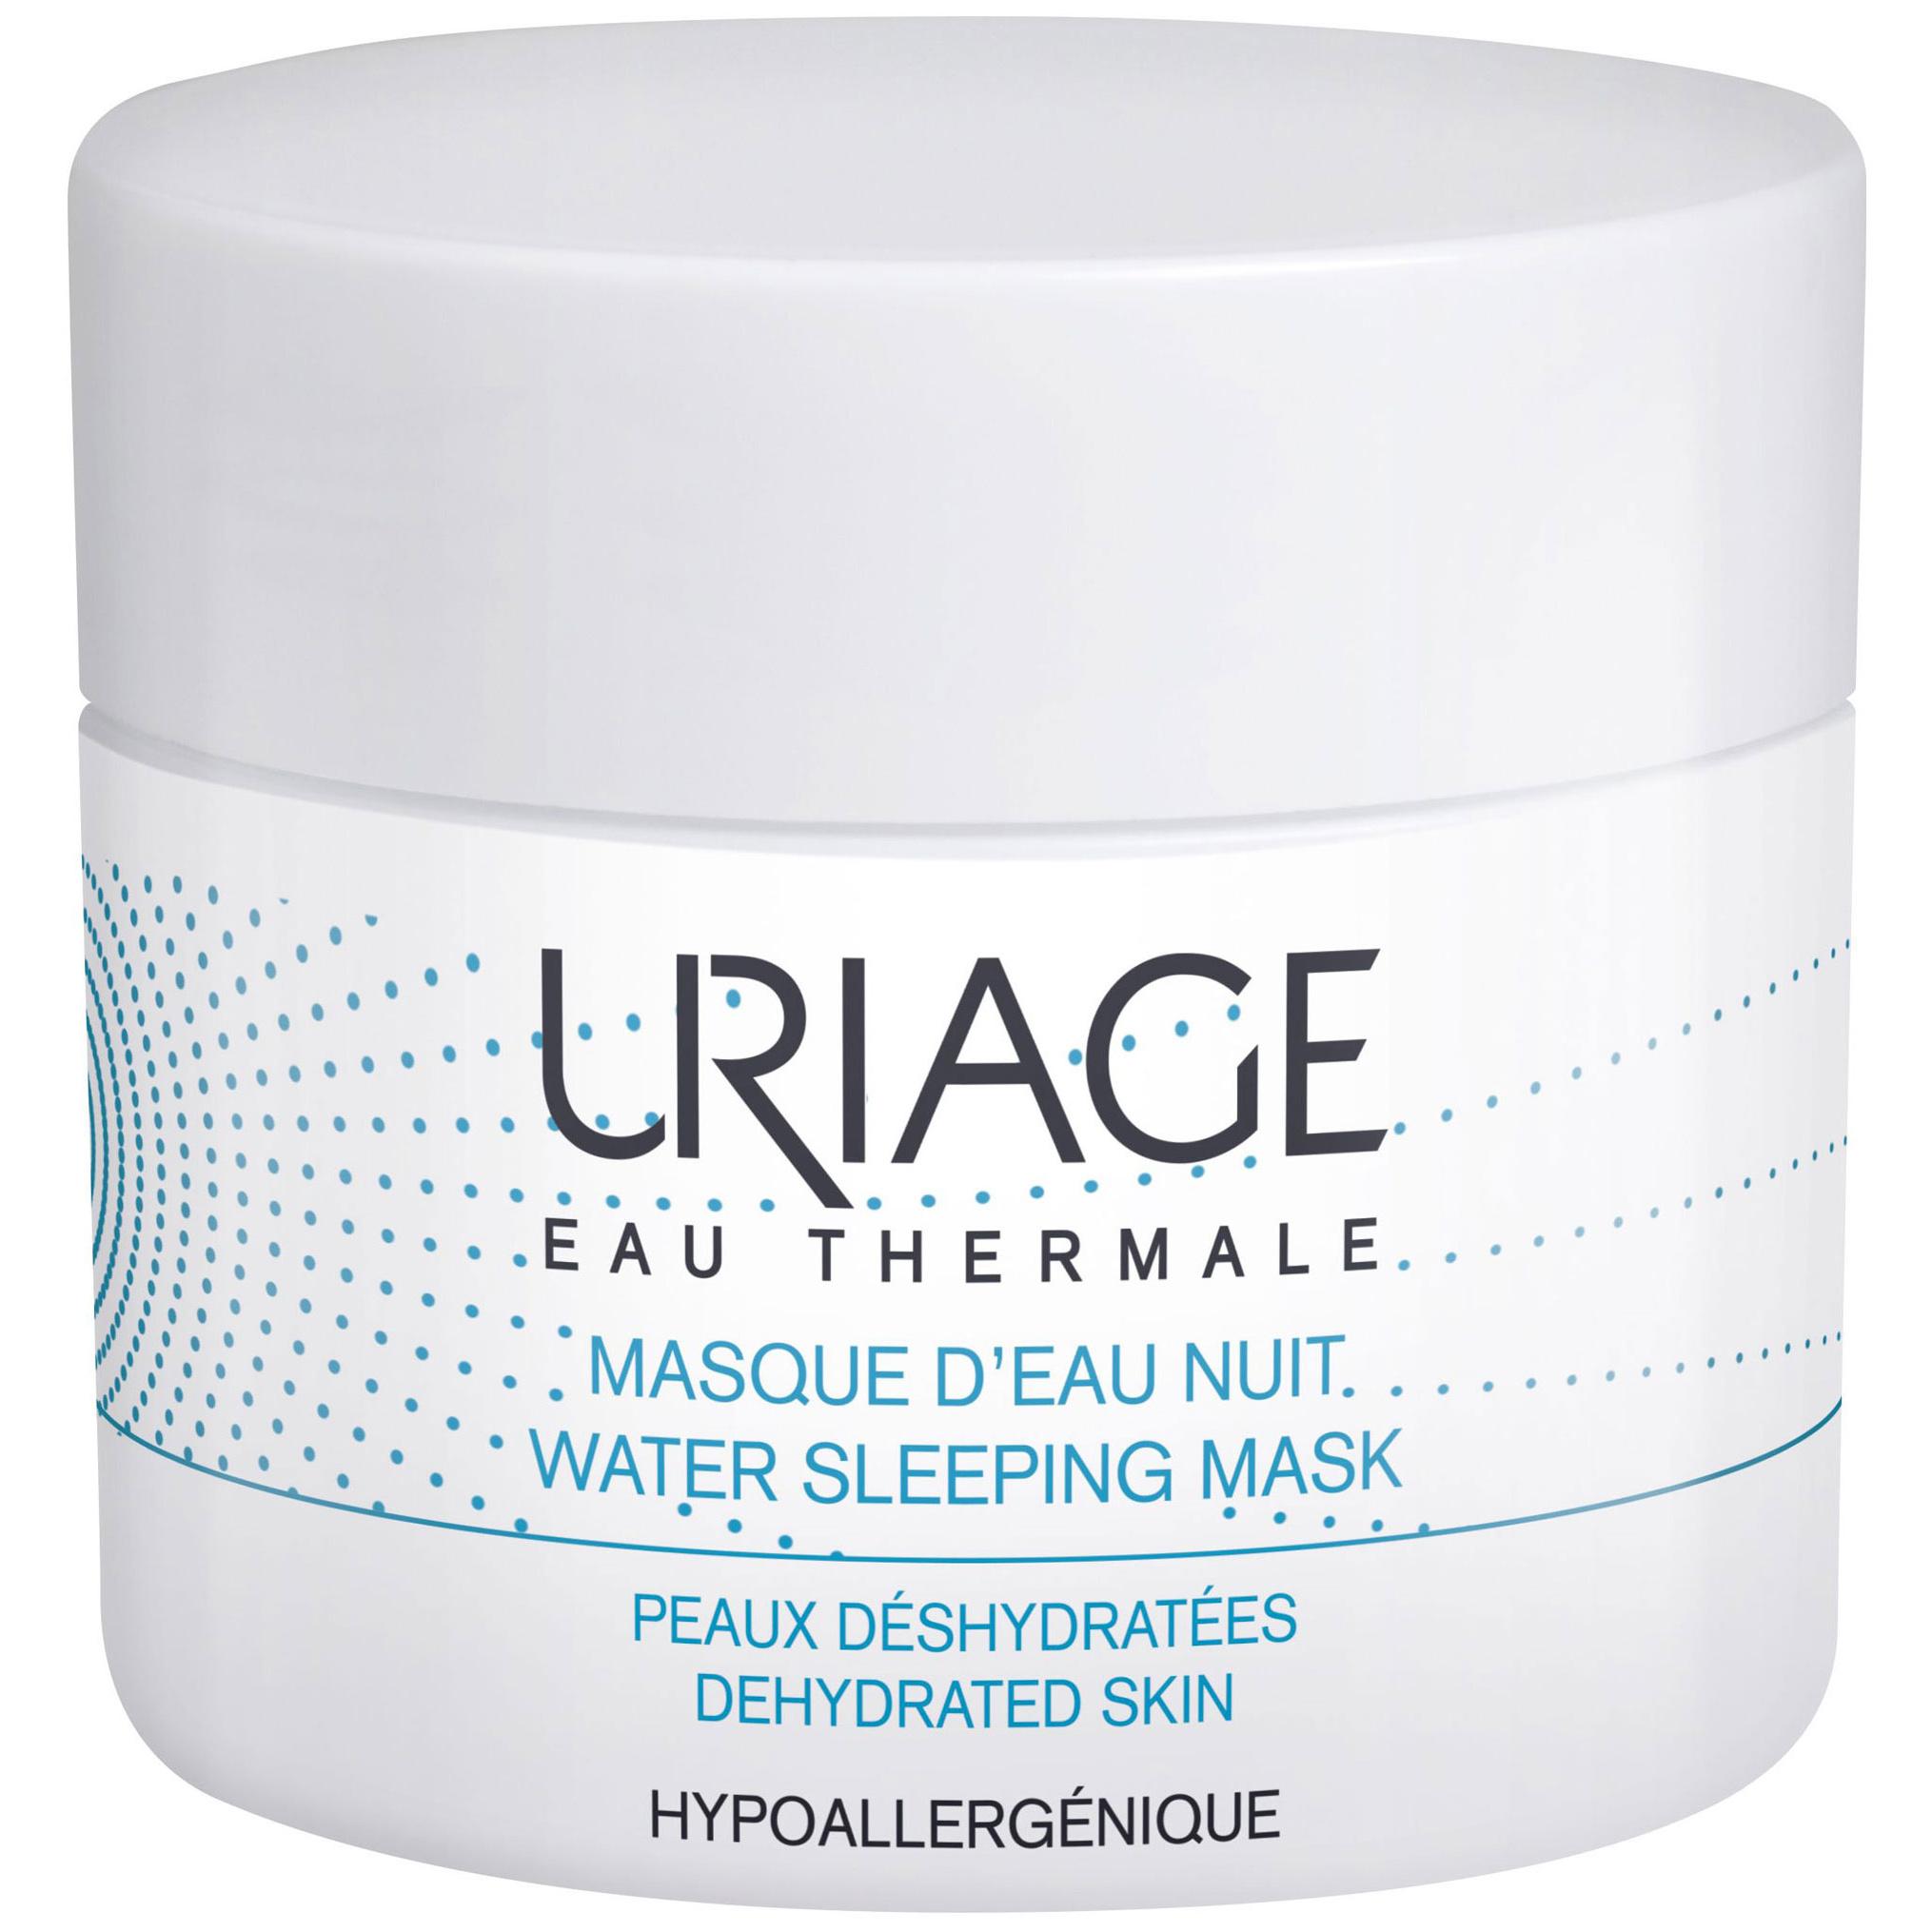 Купить Маска для лица Uriage Eau Thermale Water Sleeping 50 мл